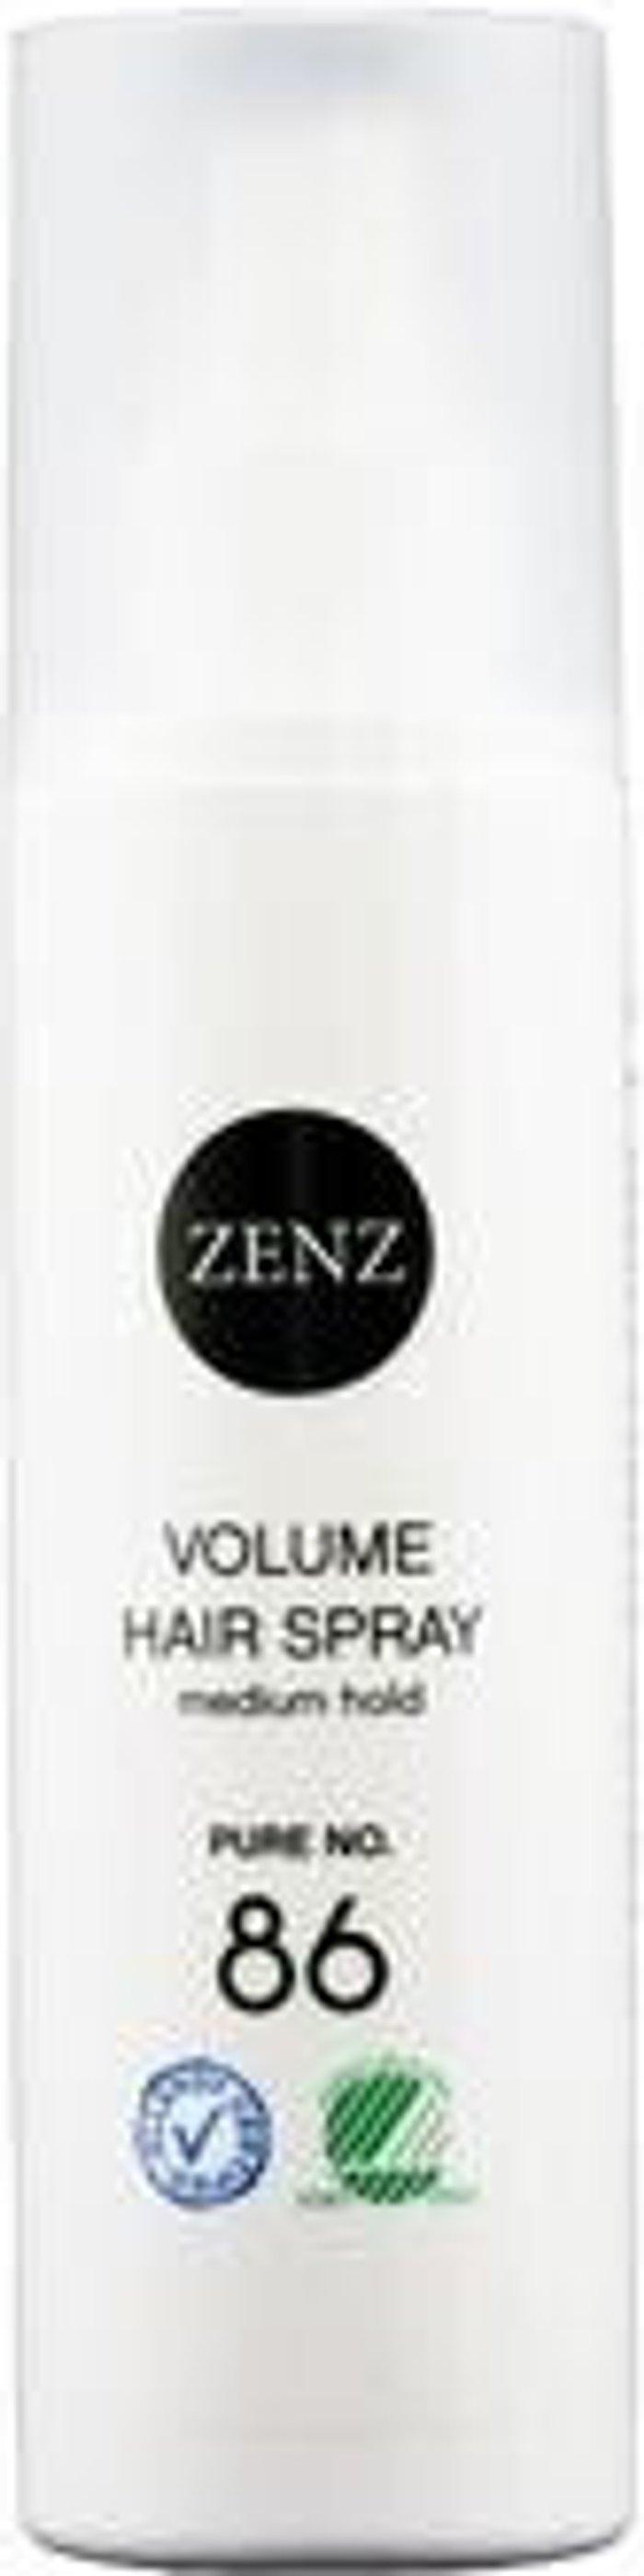 Zenz Organic Zenz Organic No. 86 Pure Volume Hair Spray Medium Hold (200 ml)